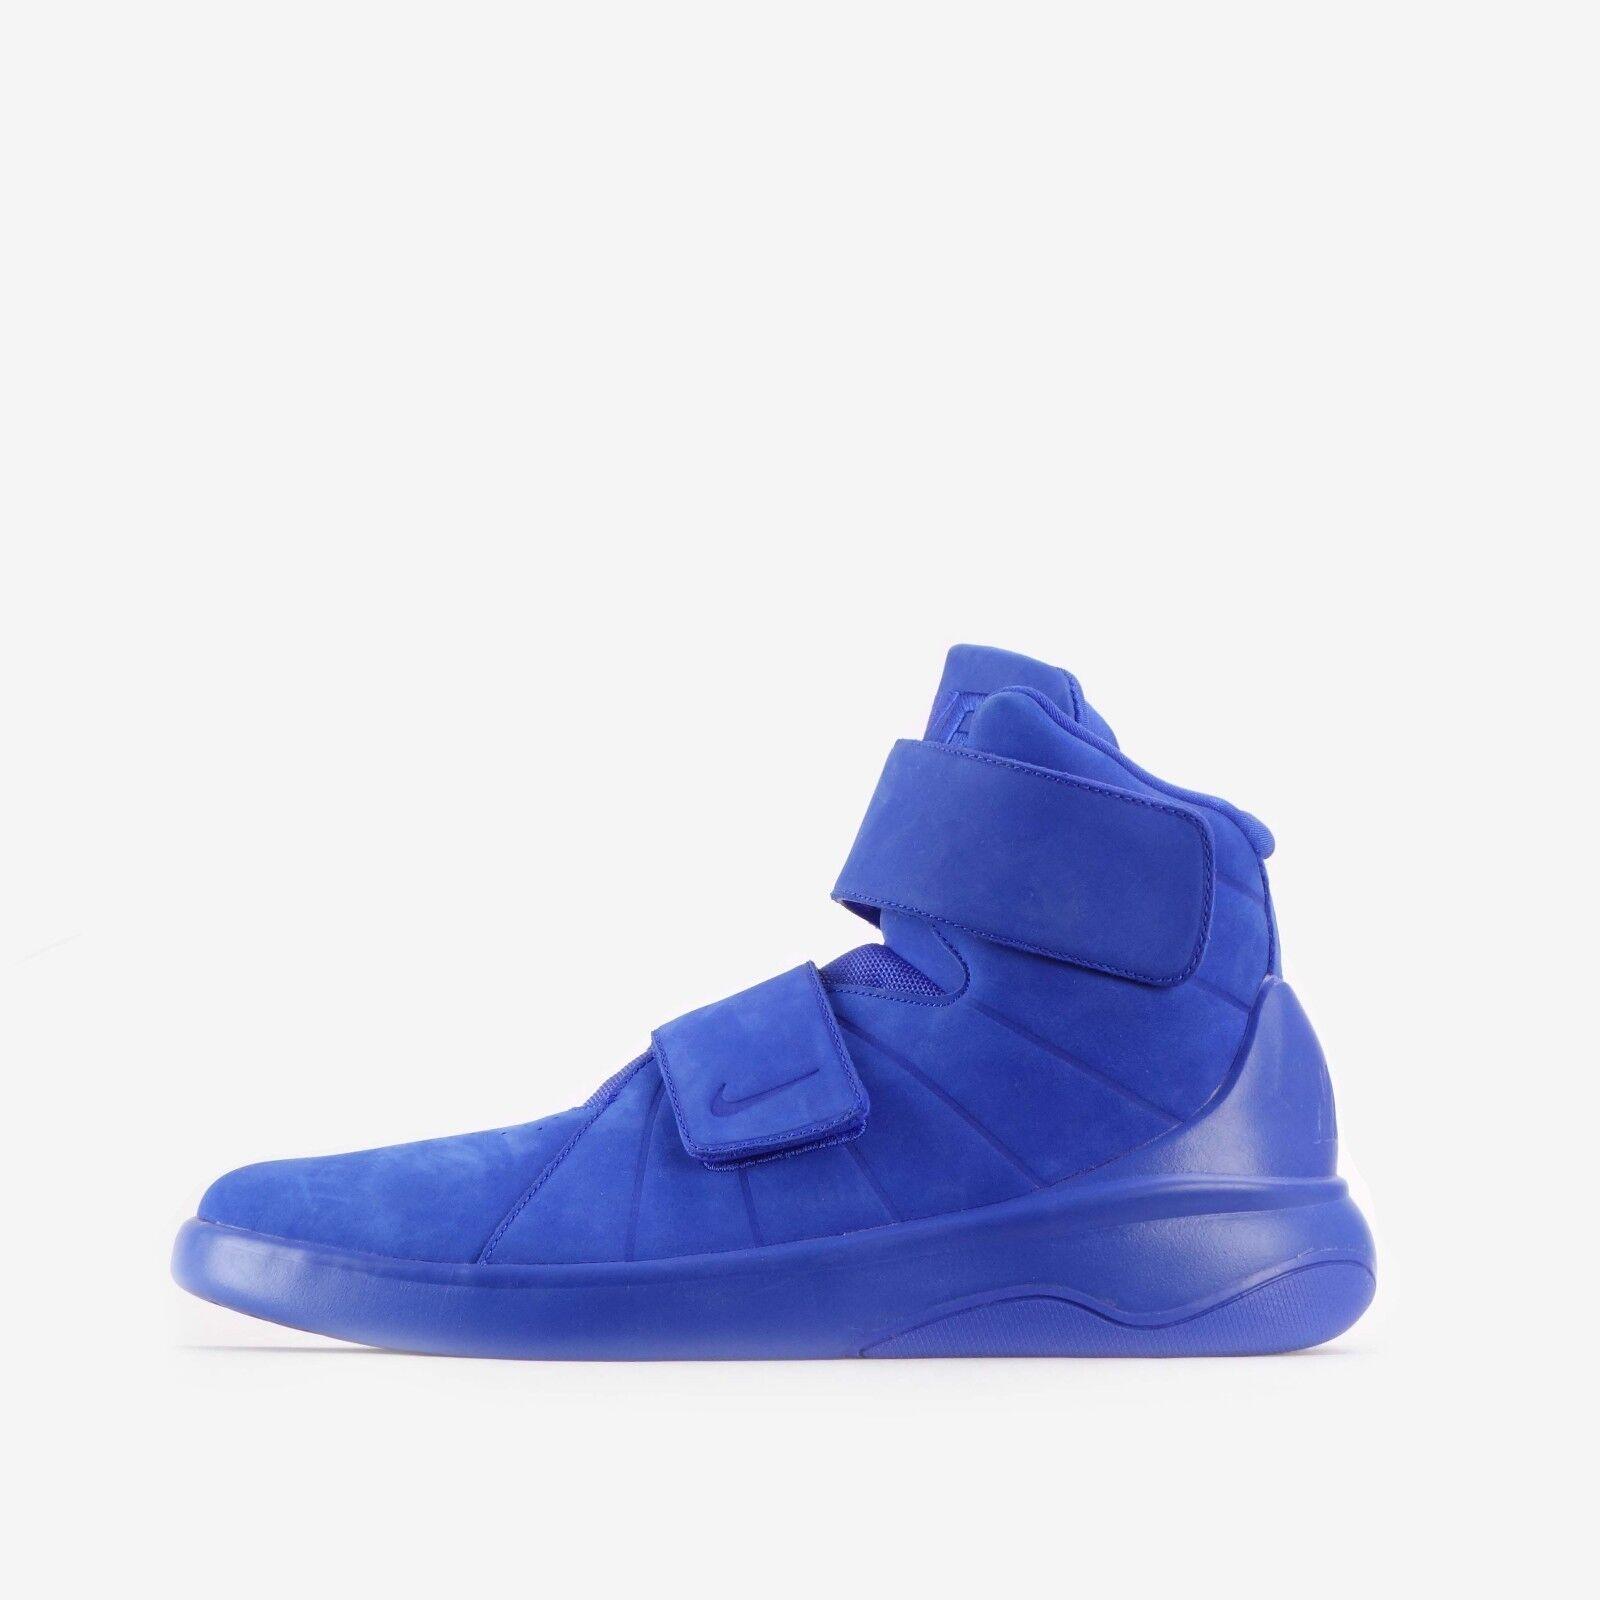 Nike Marxman Premium Men's shoes in Triple bluee